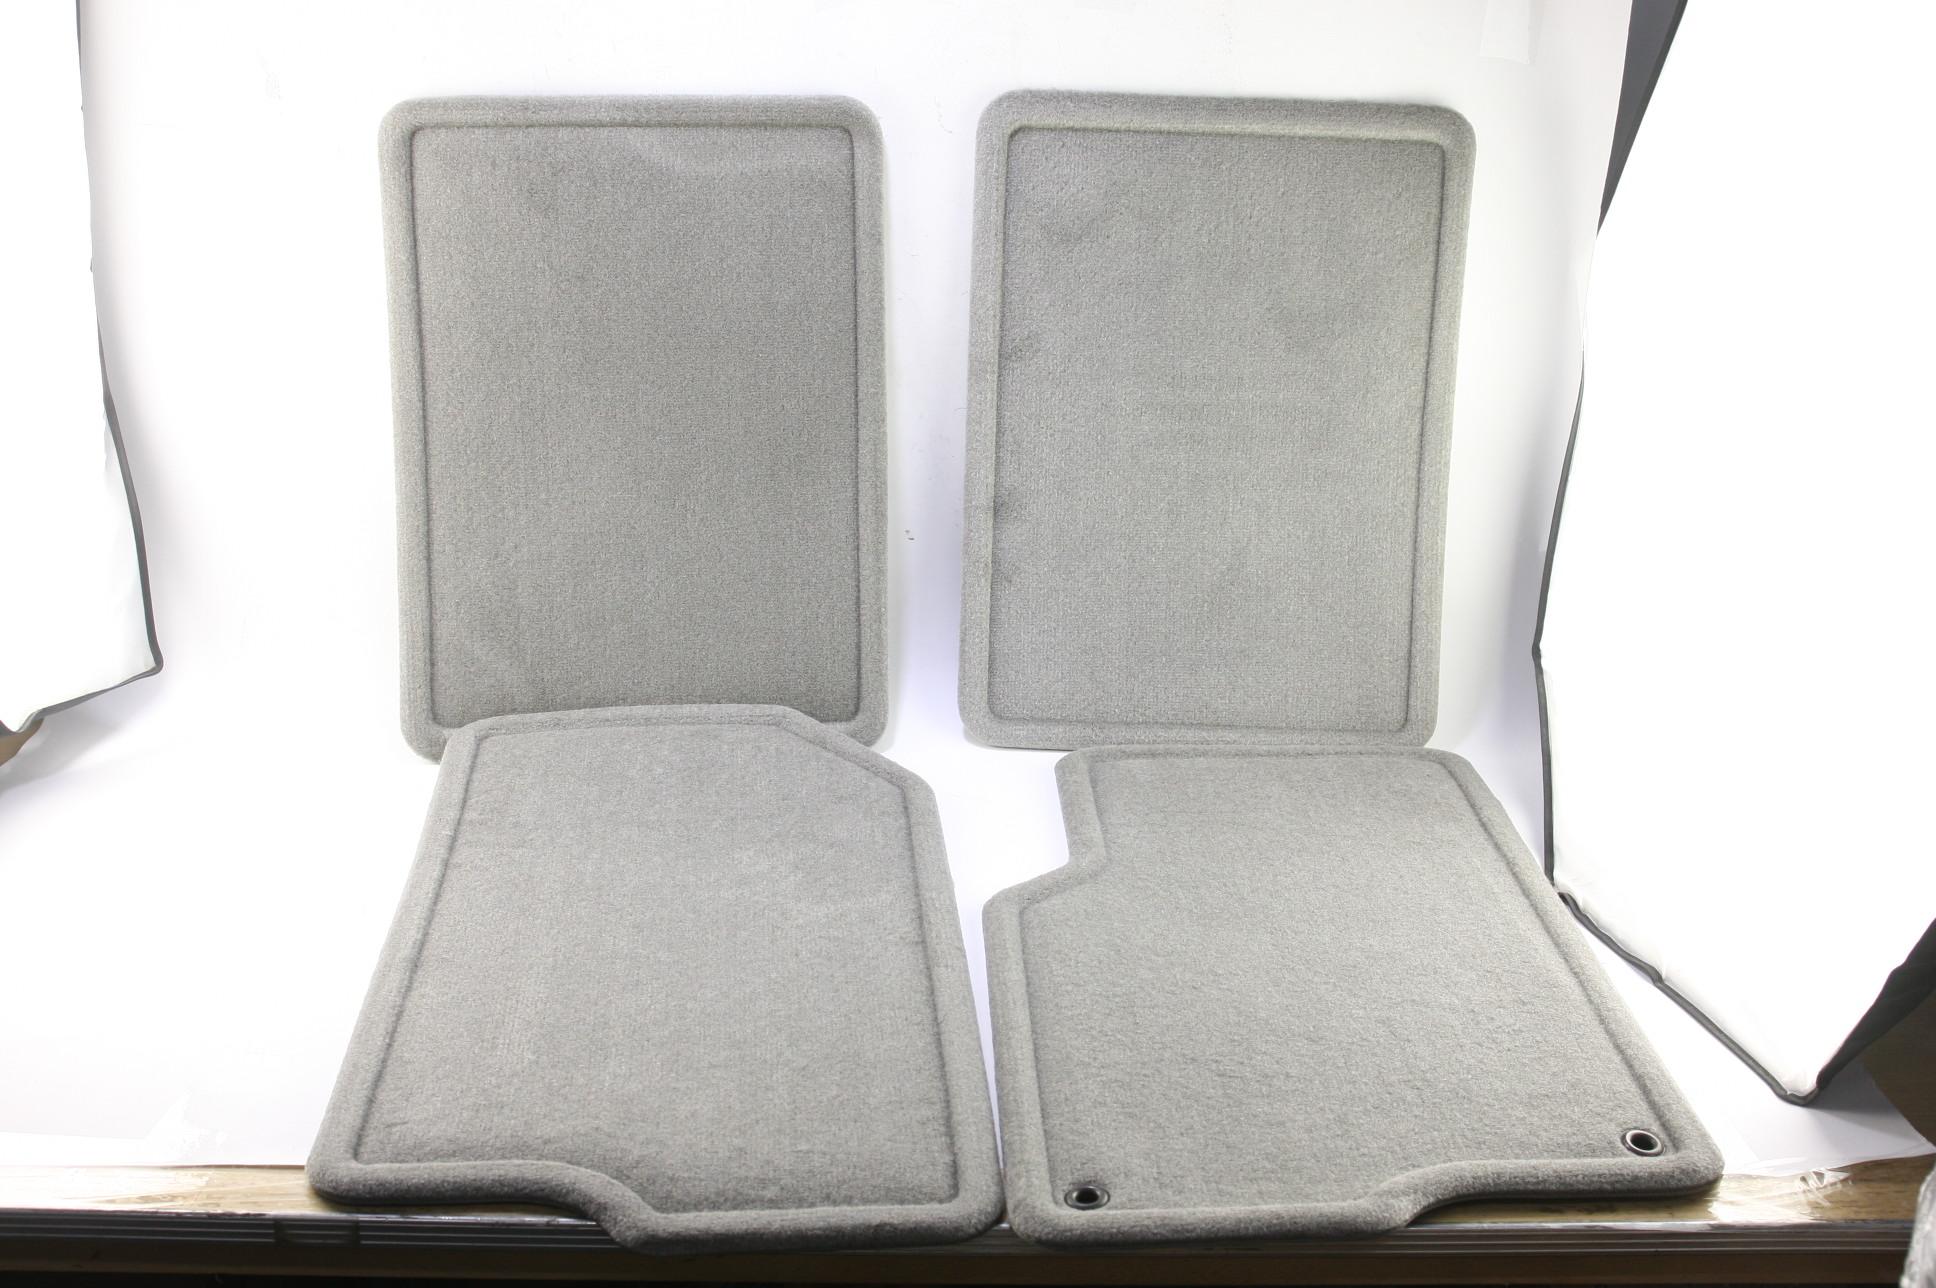 New GM OEM 15290071 05-09 Equinox Front and Rear Custom Carpet Floor Mats Gray - image 1